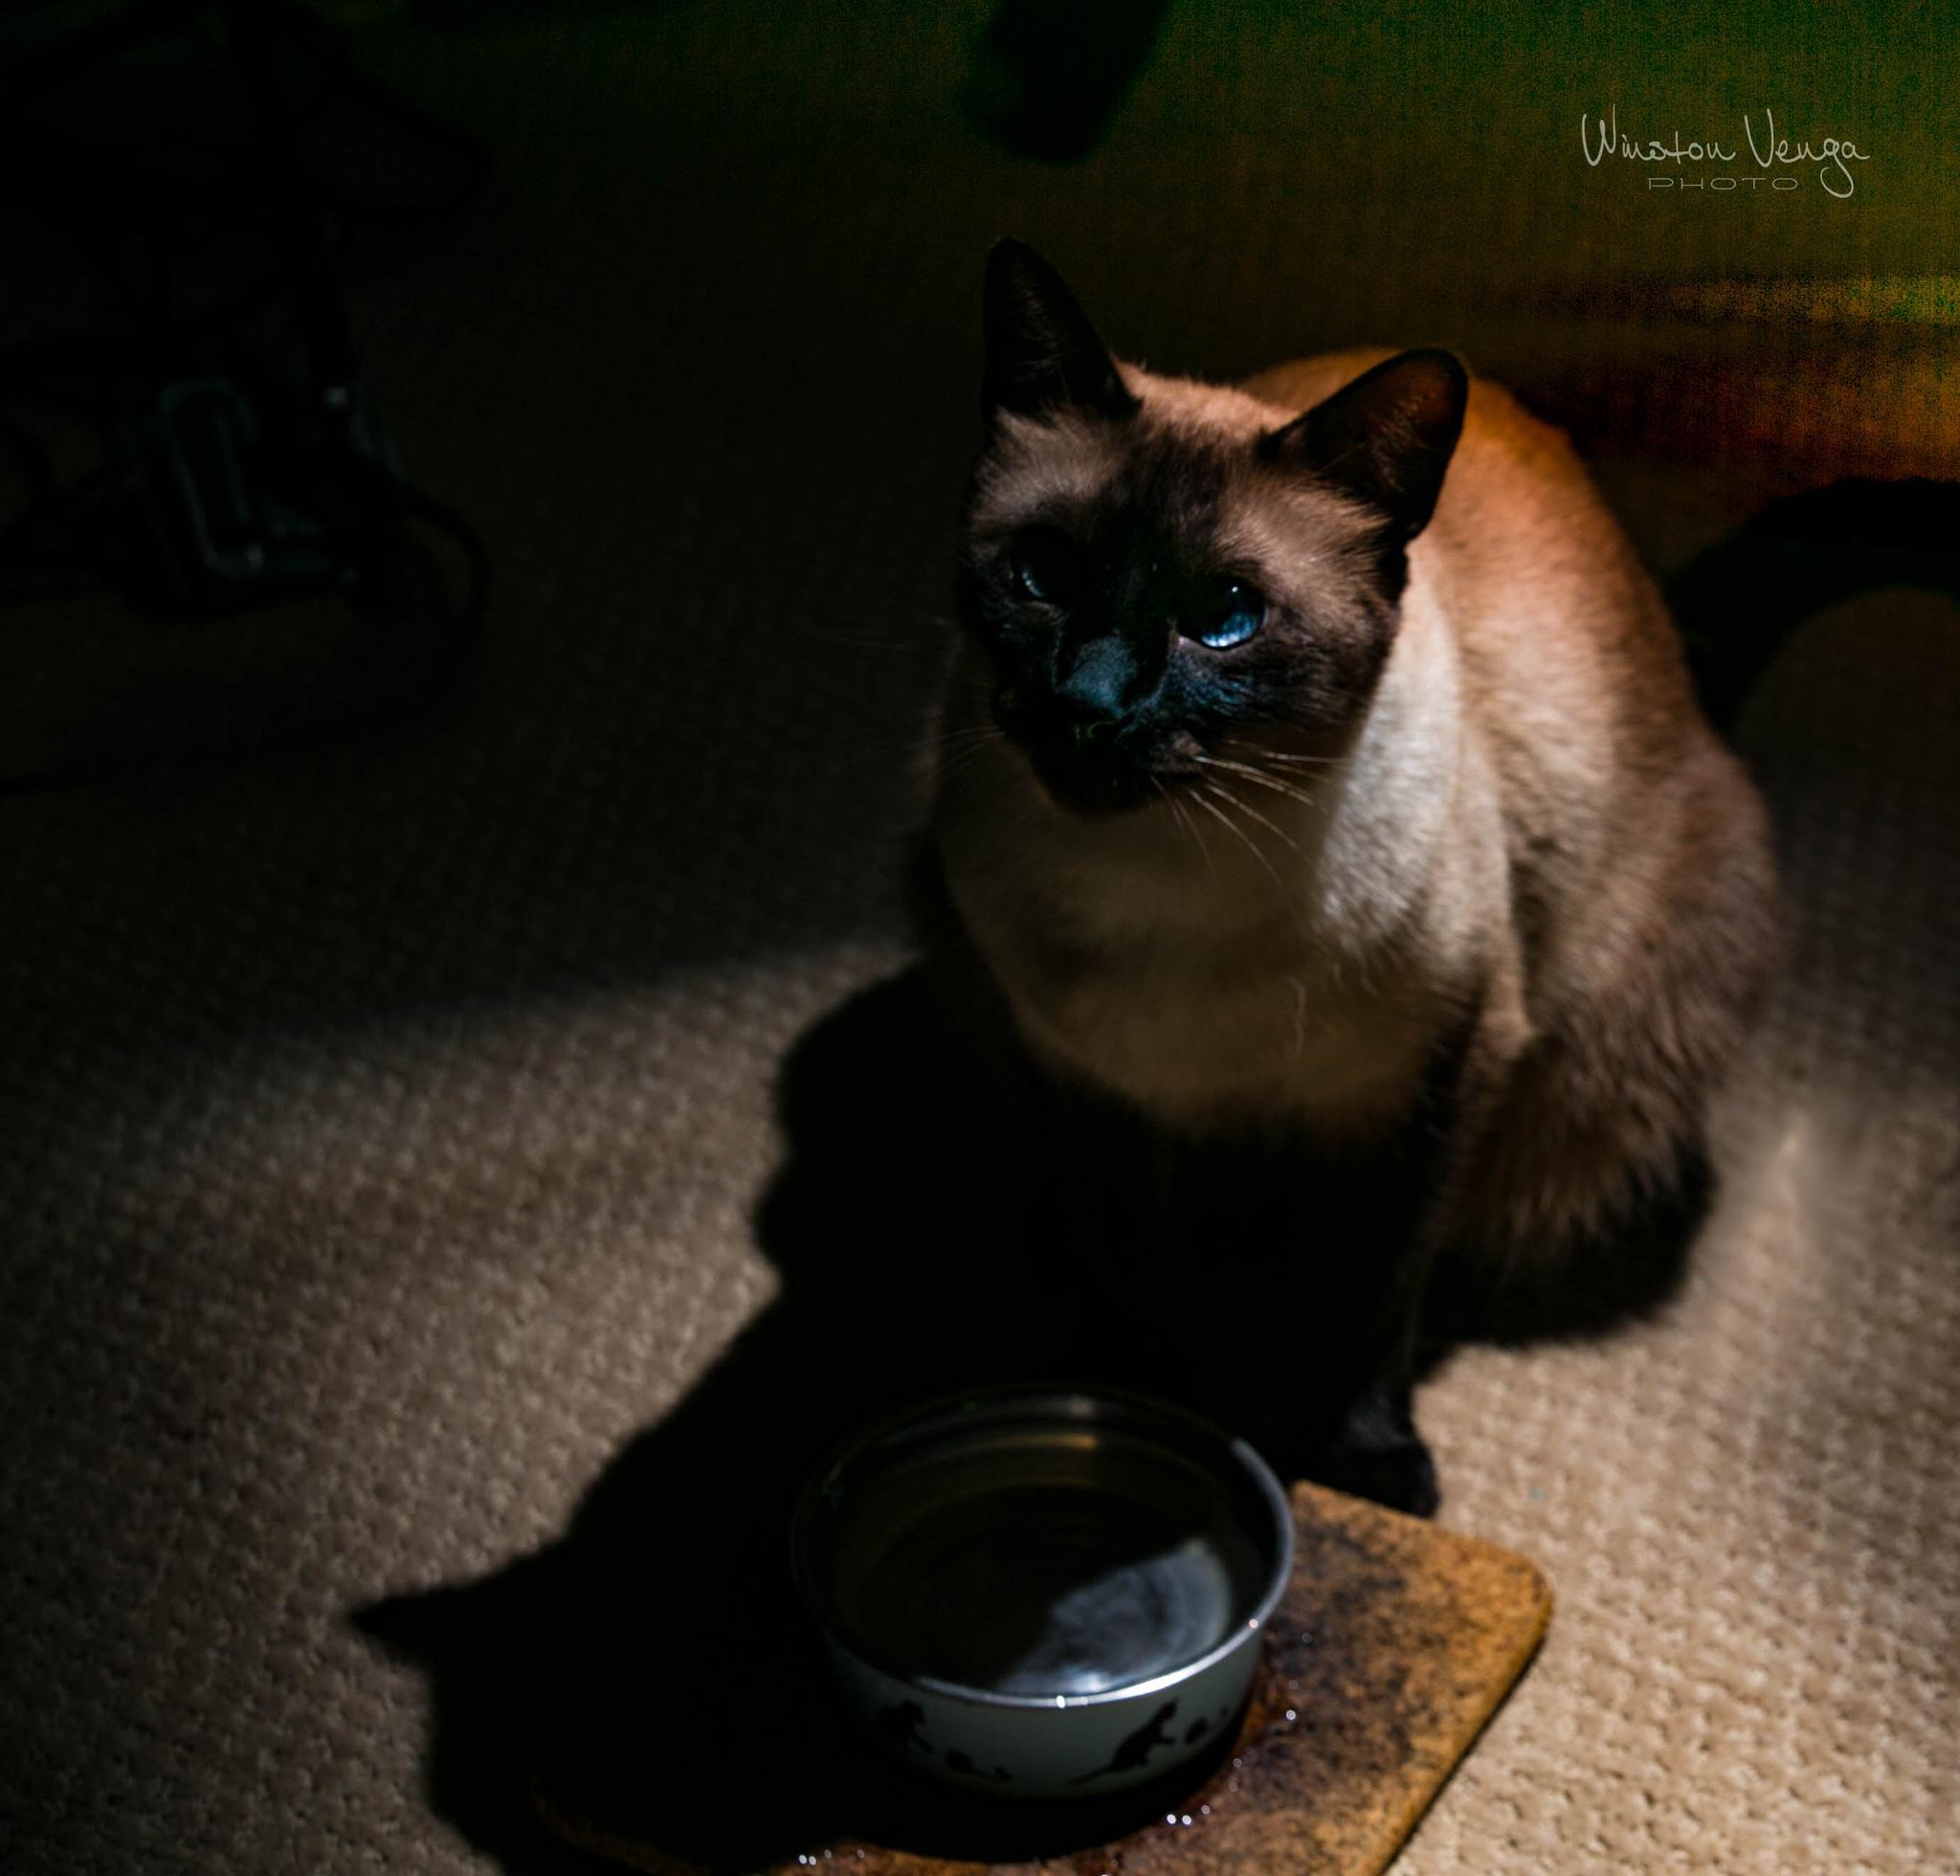 Gato (Teddy) 2 by Winston Venga